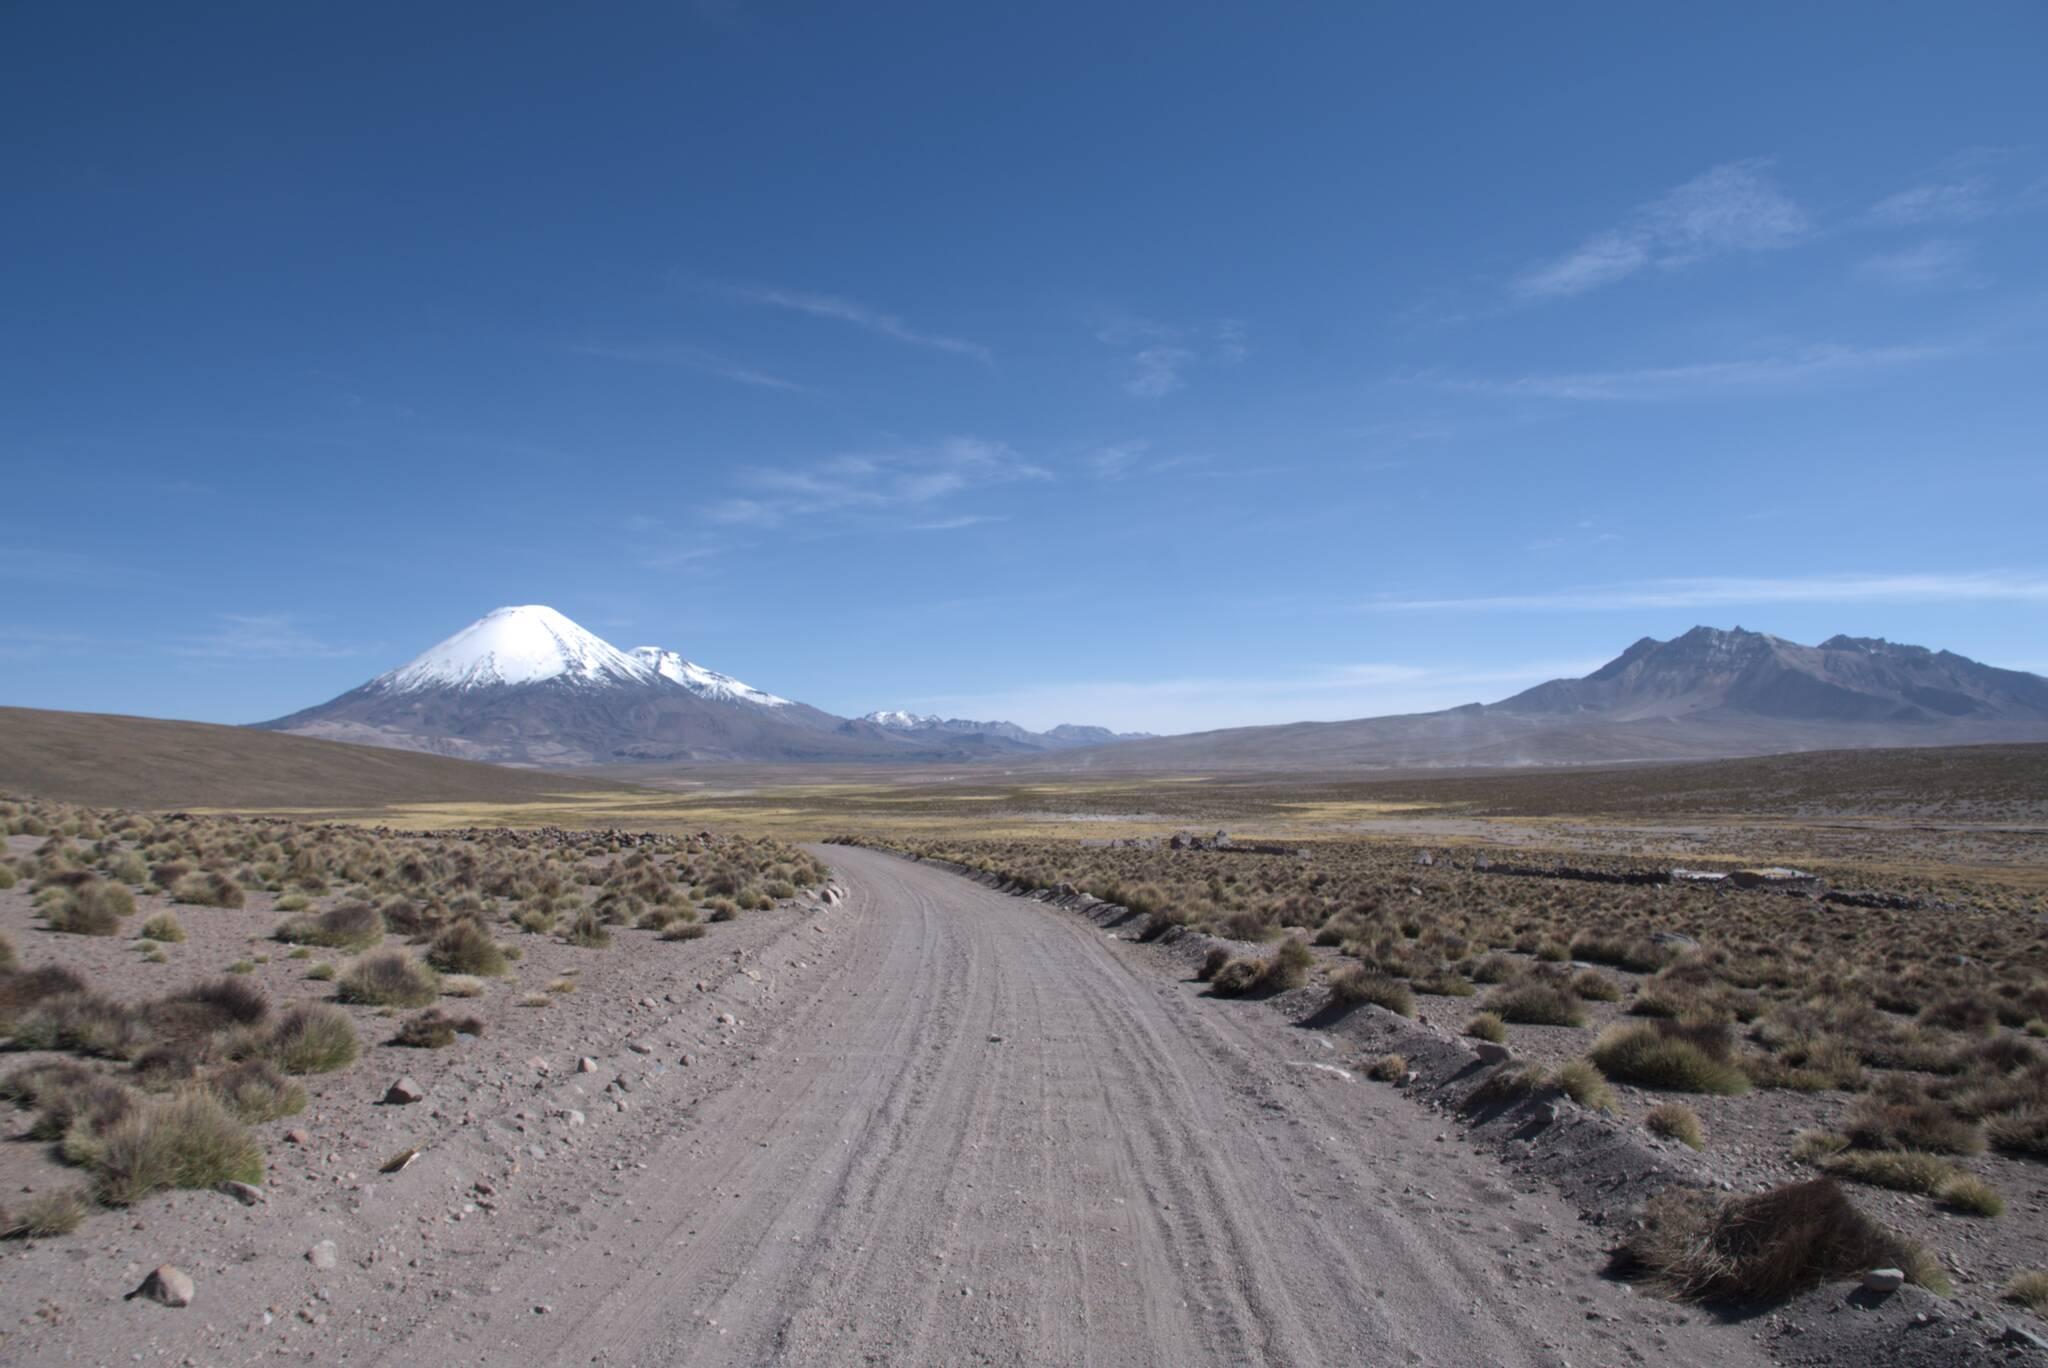 Po lewo wulkan Parinacota, po prawo Boliwia